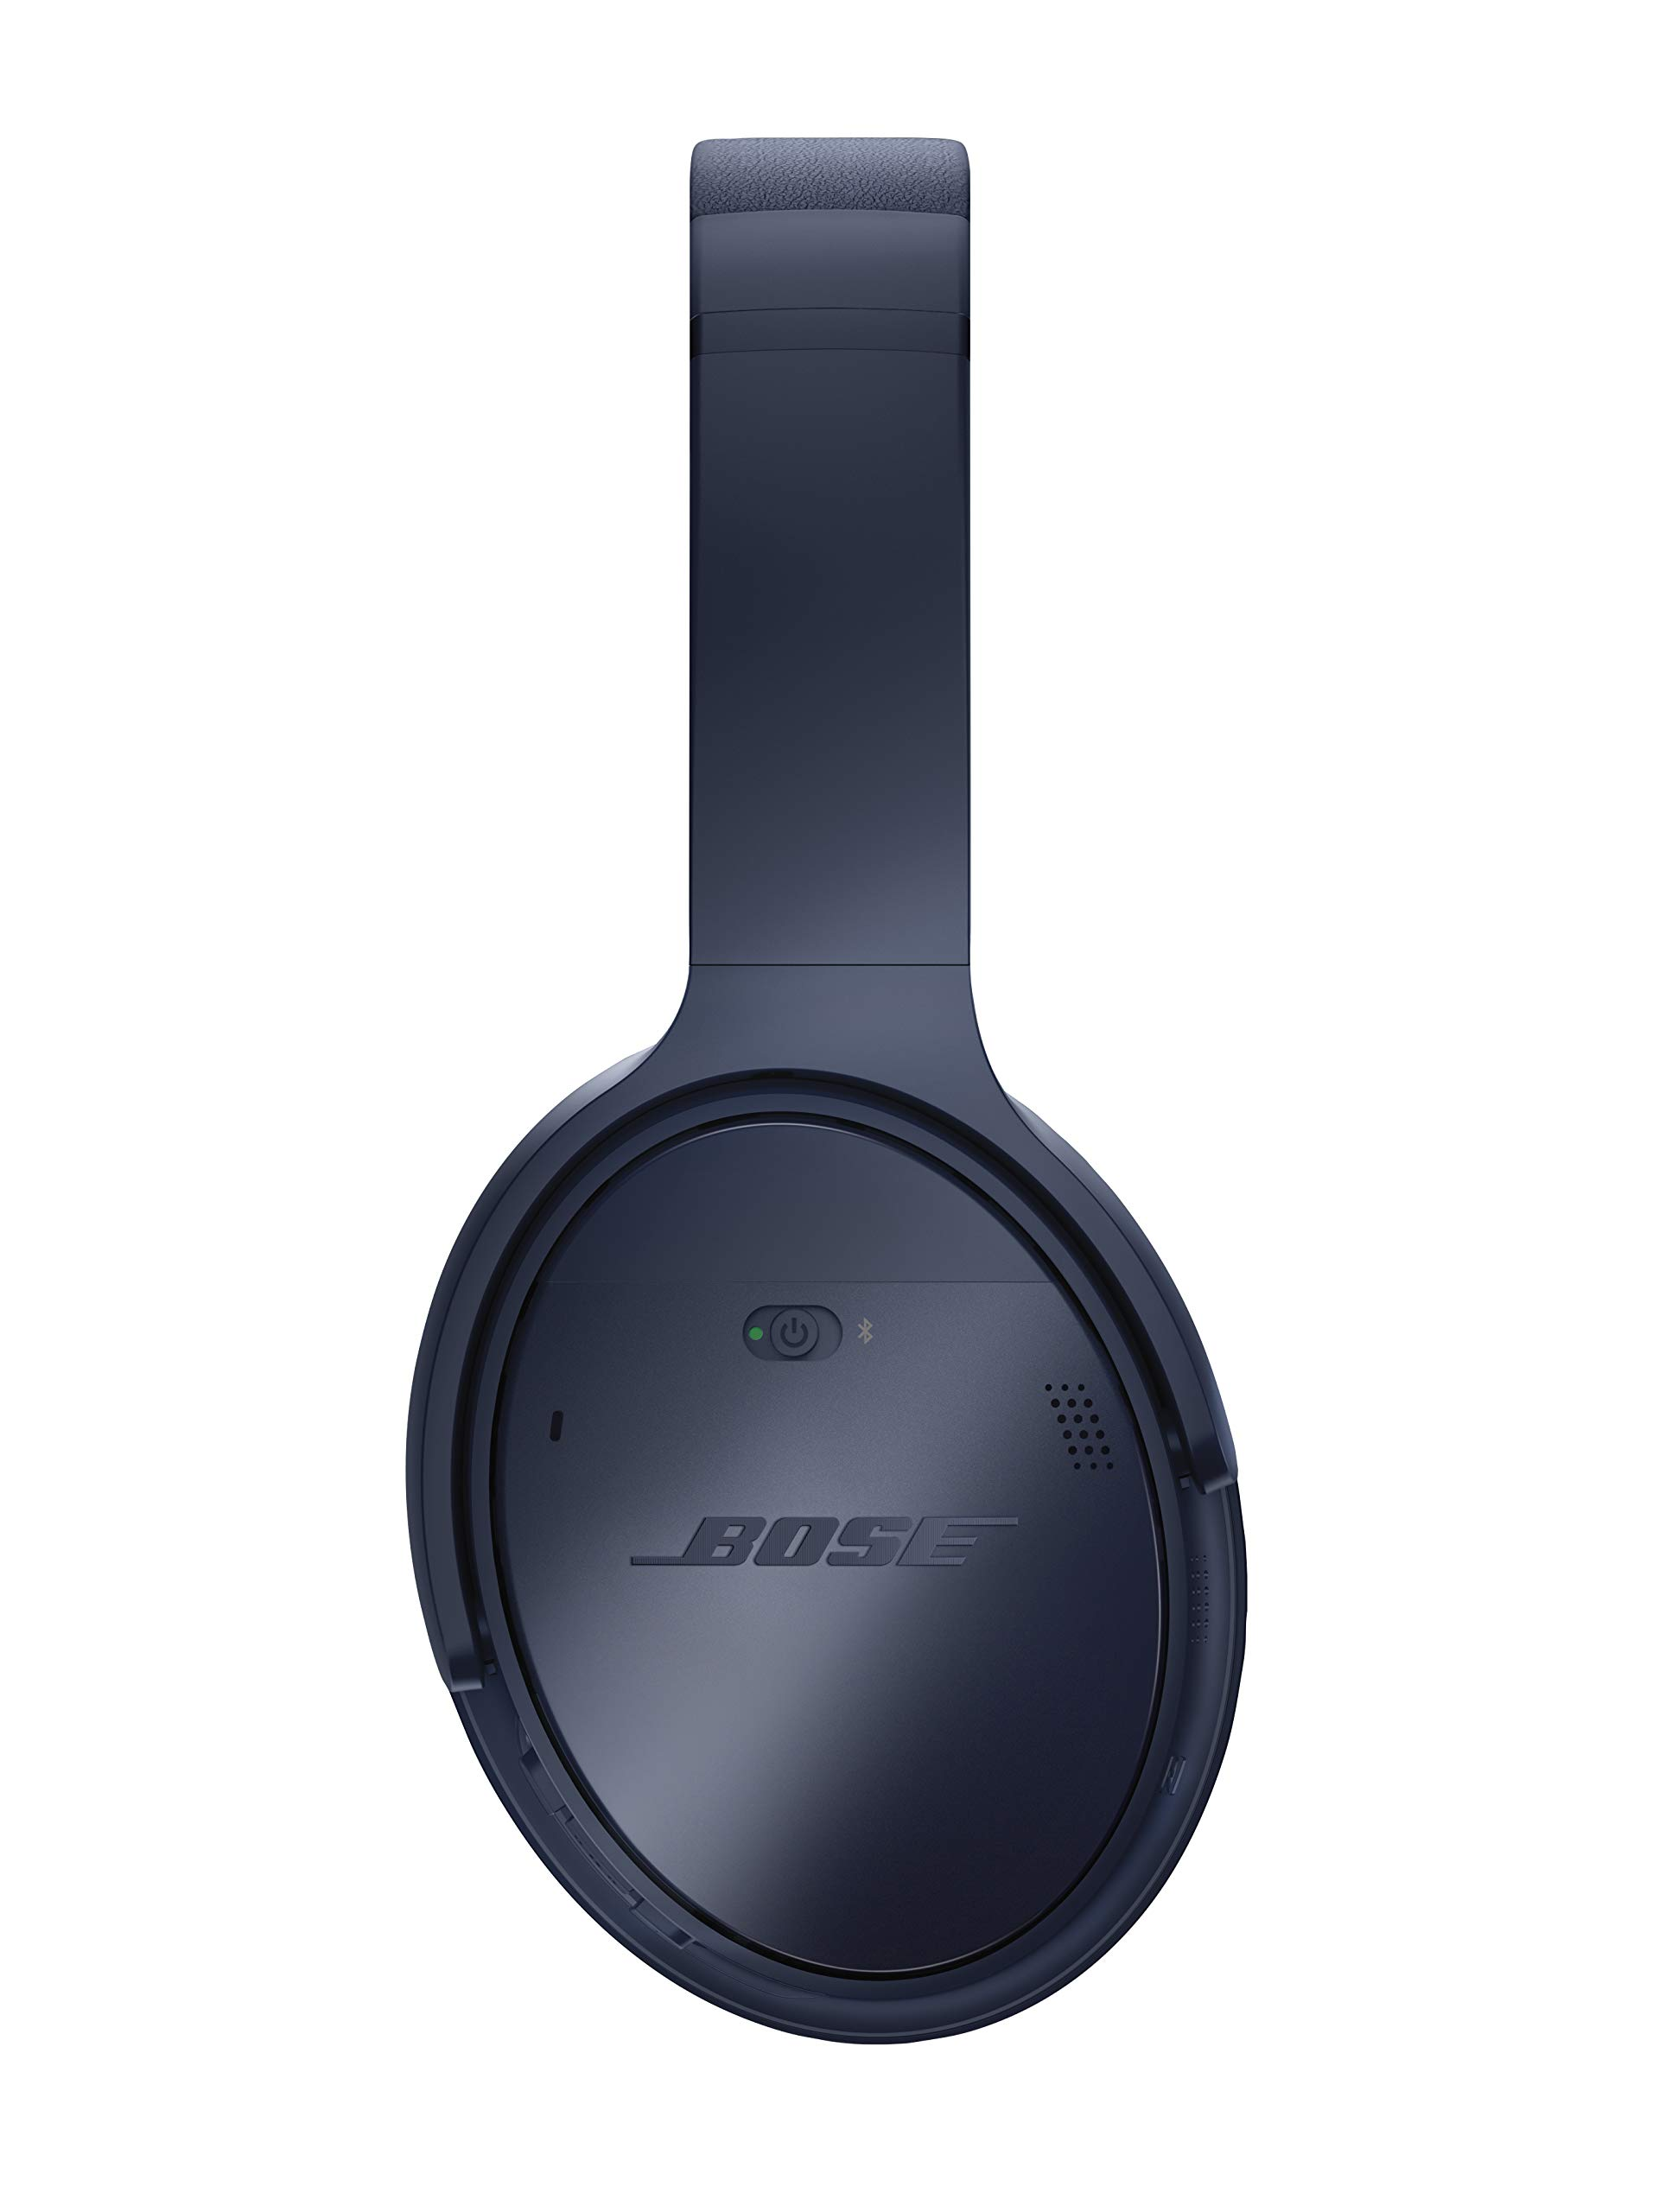 Bose QuietComfort 35 (Series II) Wireless Headphones, Noise Cancelling, with Alexa voice control – Triple Midnight